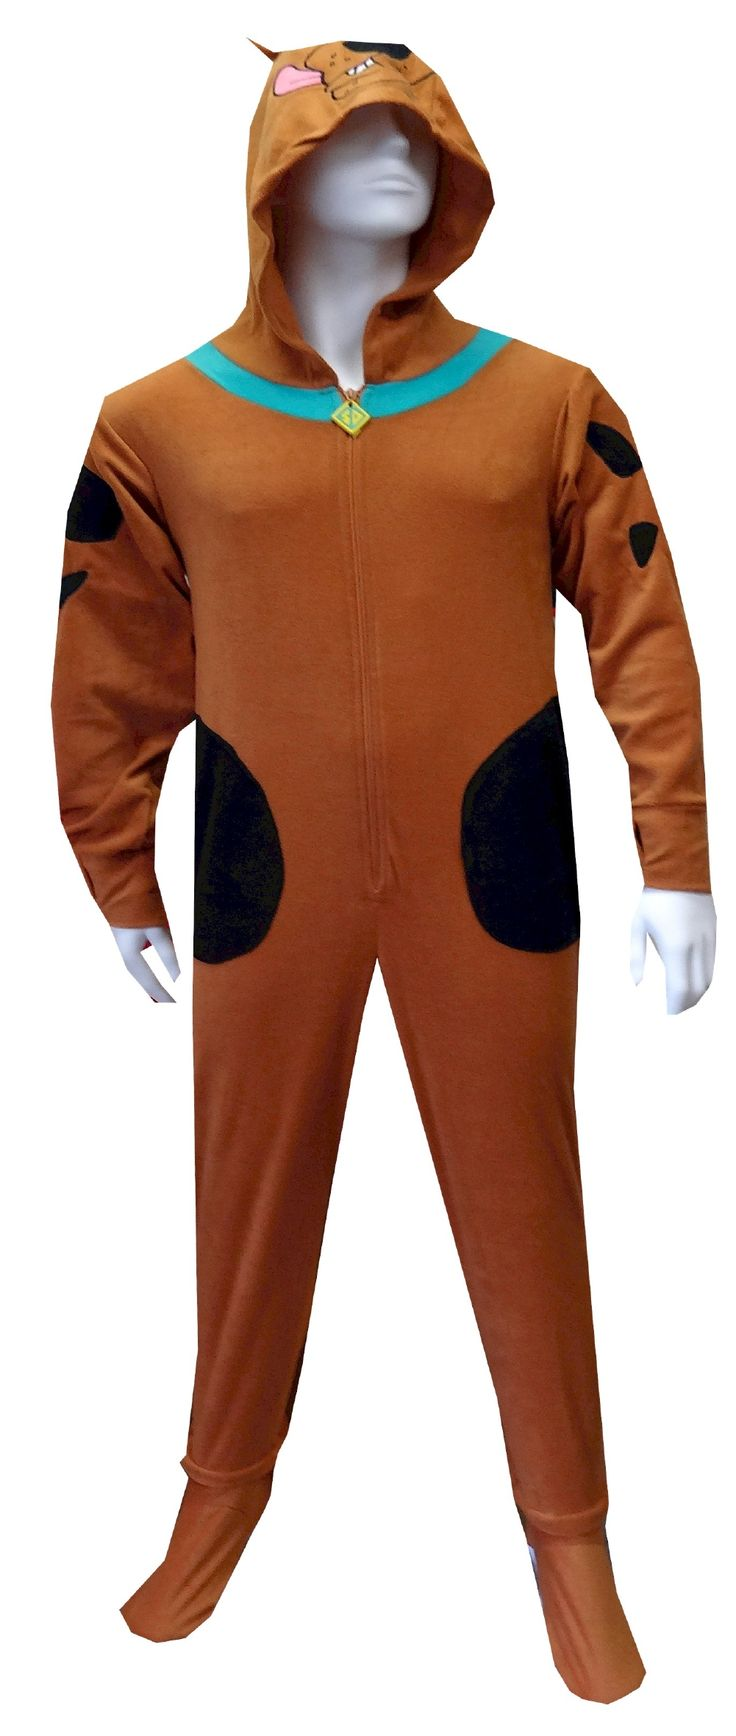 scooby doo adult footie pajamas with hood $ 38.00